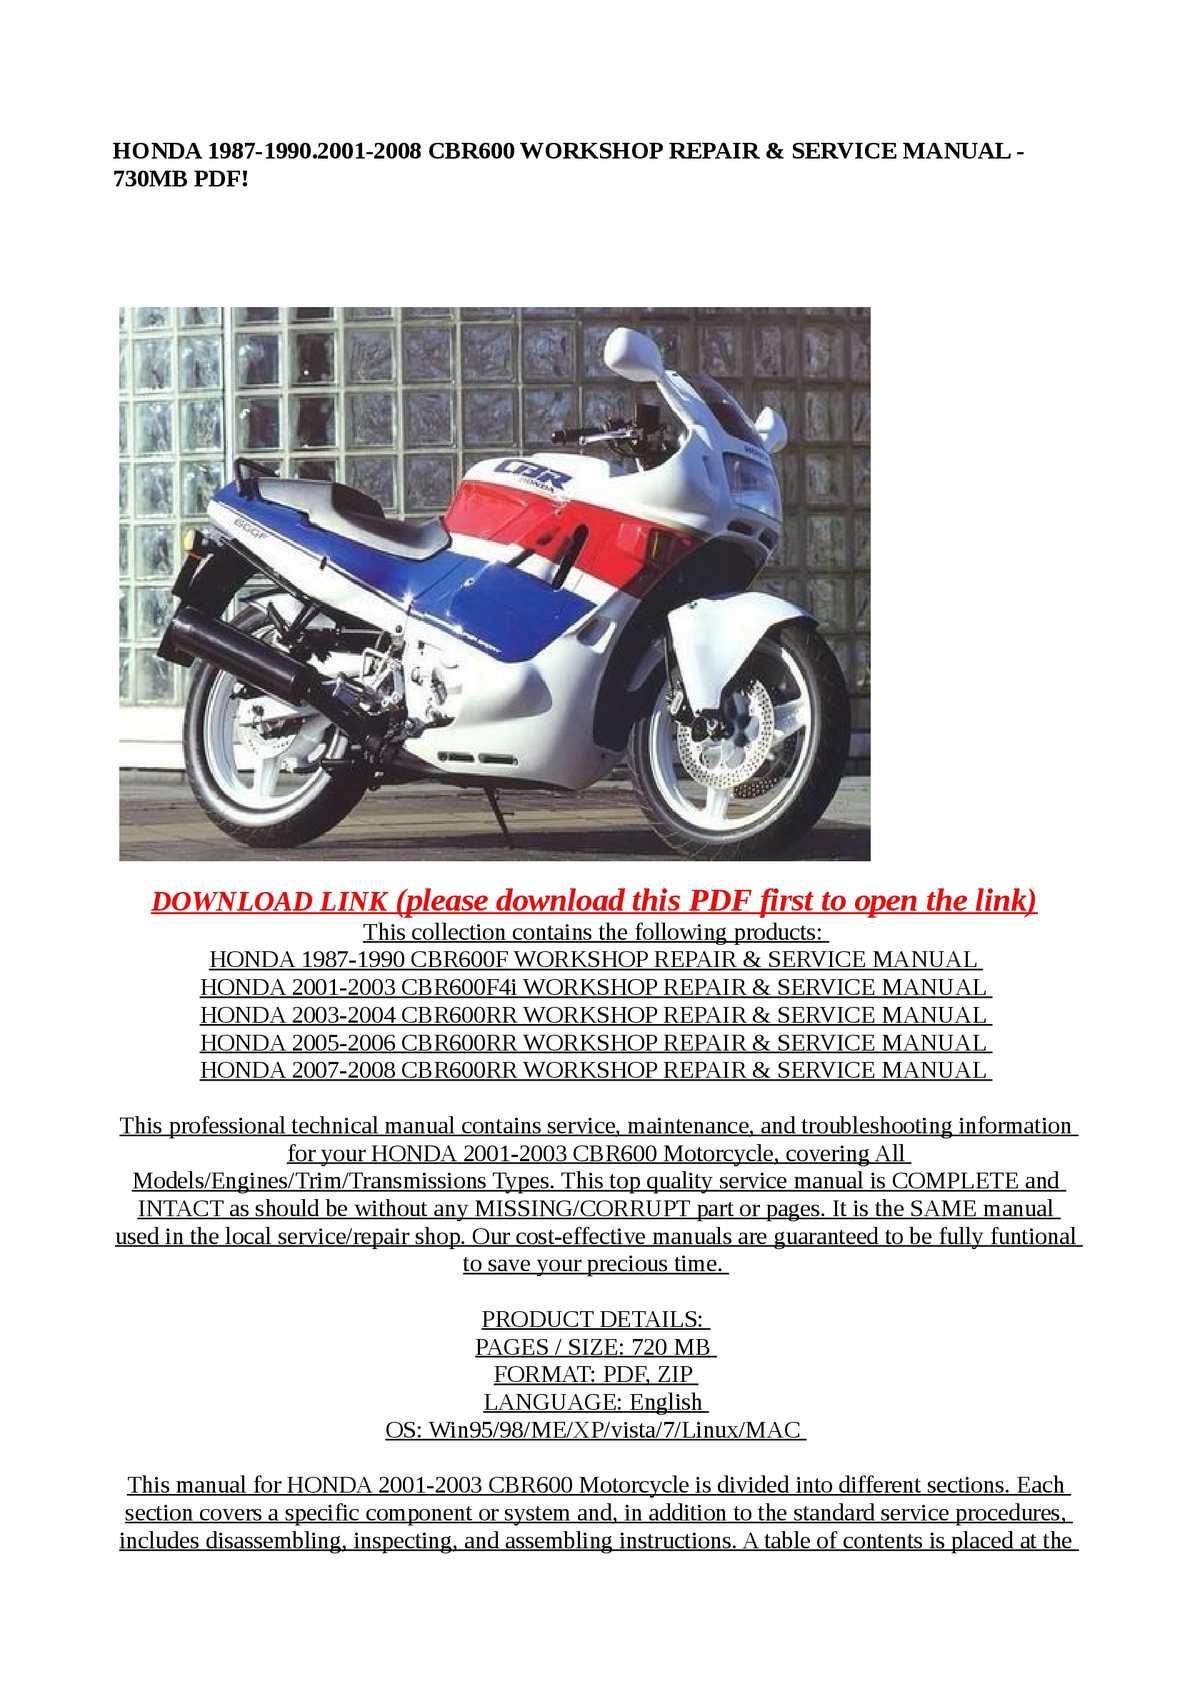 Calamo Honda 1987 19902001 2008 Cbr600 Workshop Repair Serv 2005 Cbr 600 Rr Color Wiring Diagram